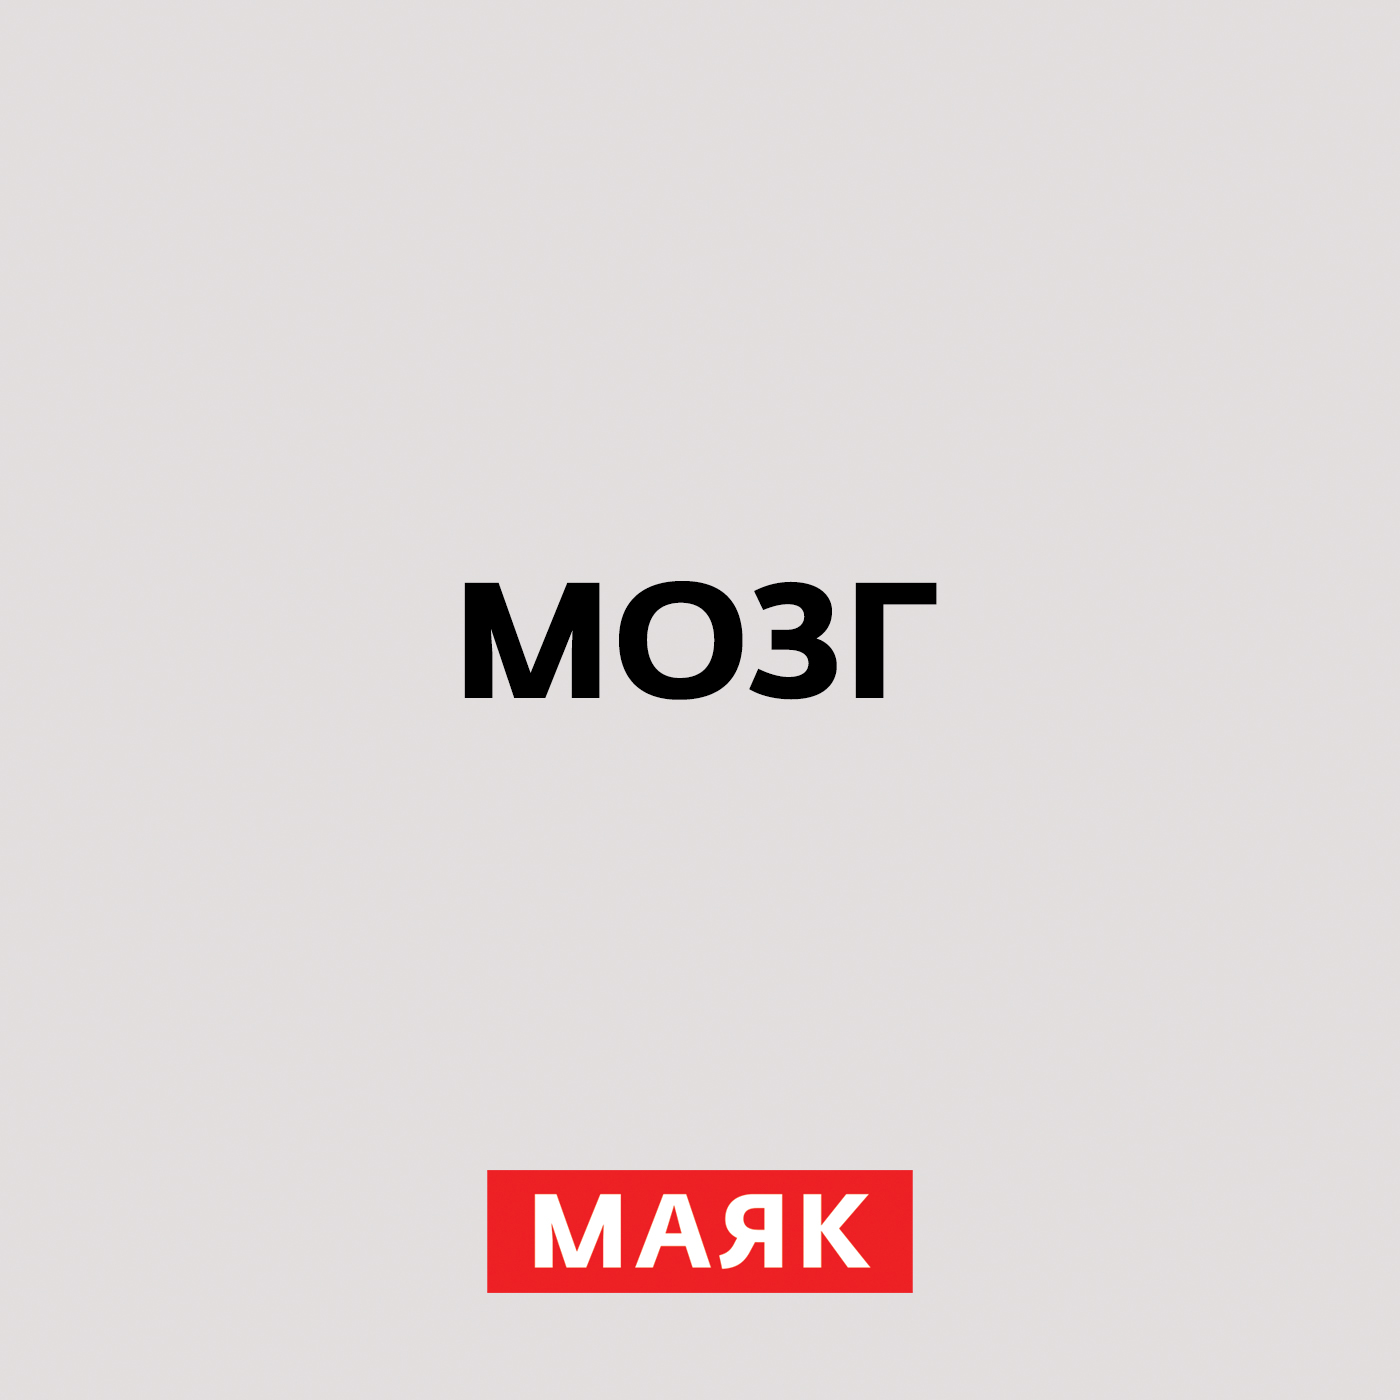 Творческий коллектив шоу «Объект 22» Карл Густав Юнг творческий коллектив шоу объект 22 карл густав юнг